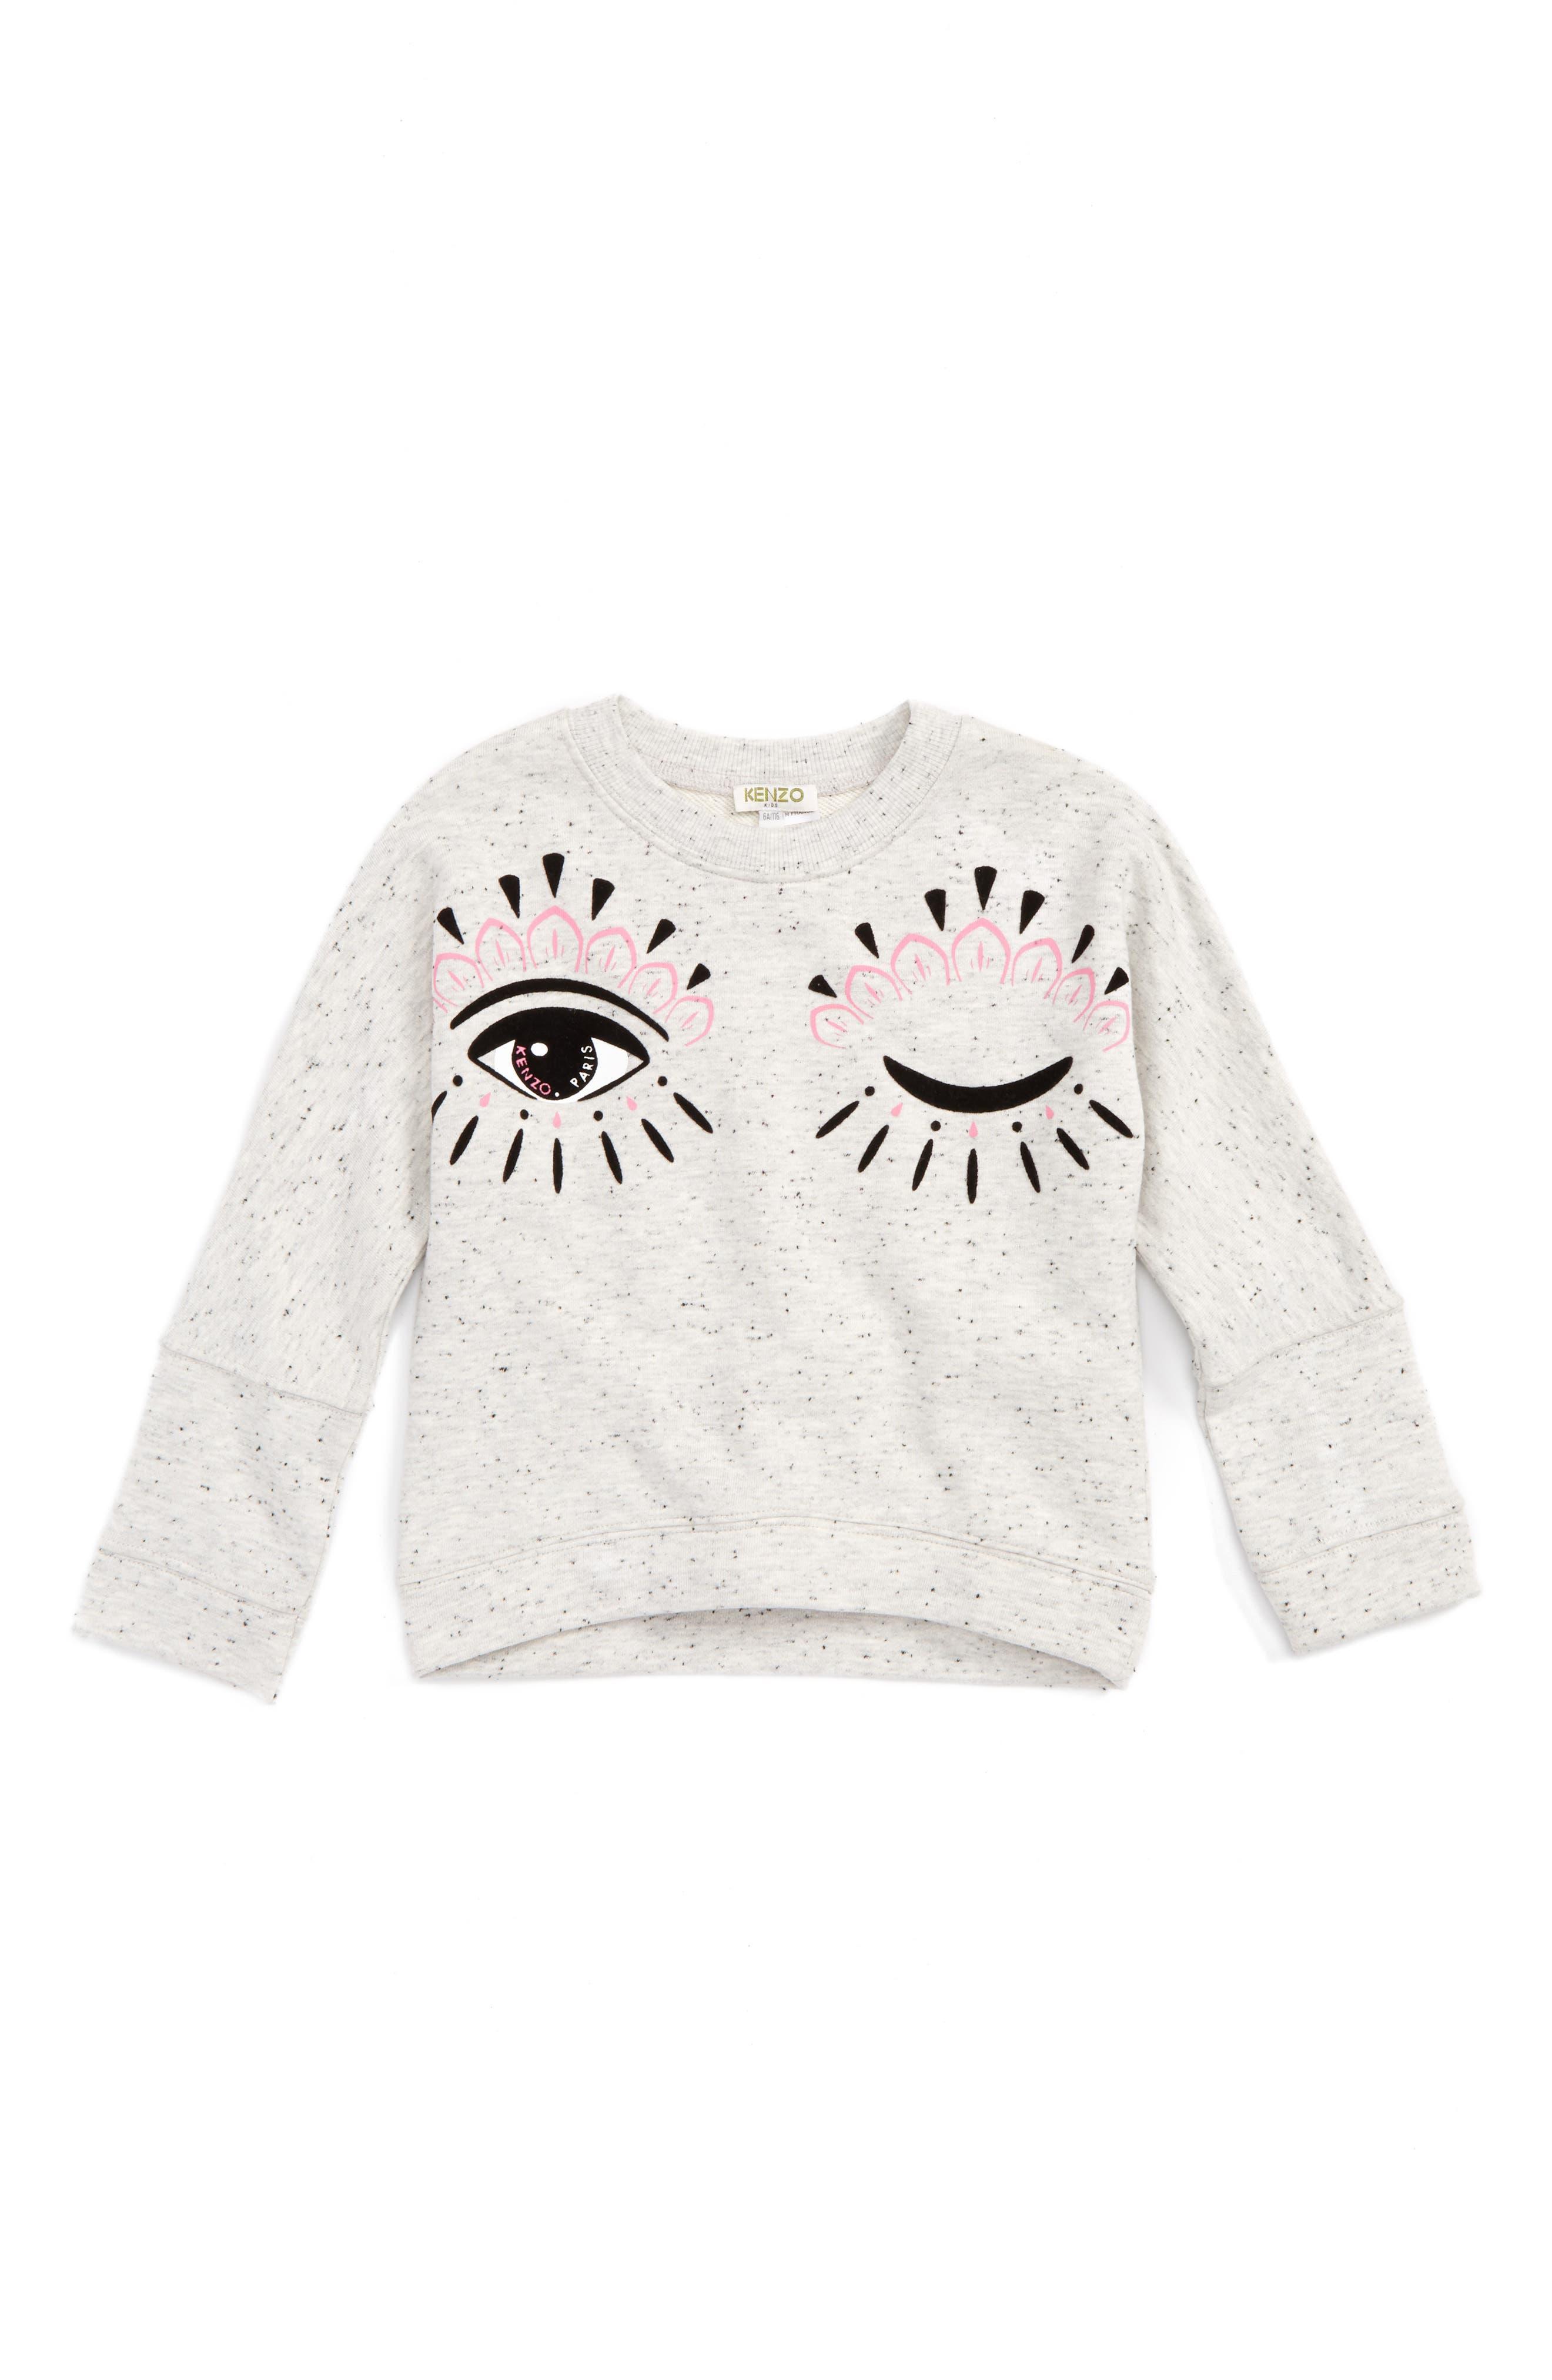 Blinking Eye Sweatshirt,                             Main thumbnail 1, color,                             030